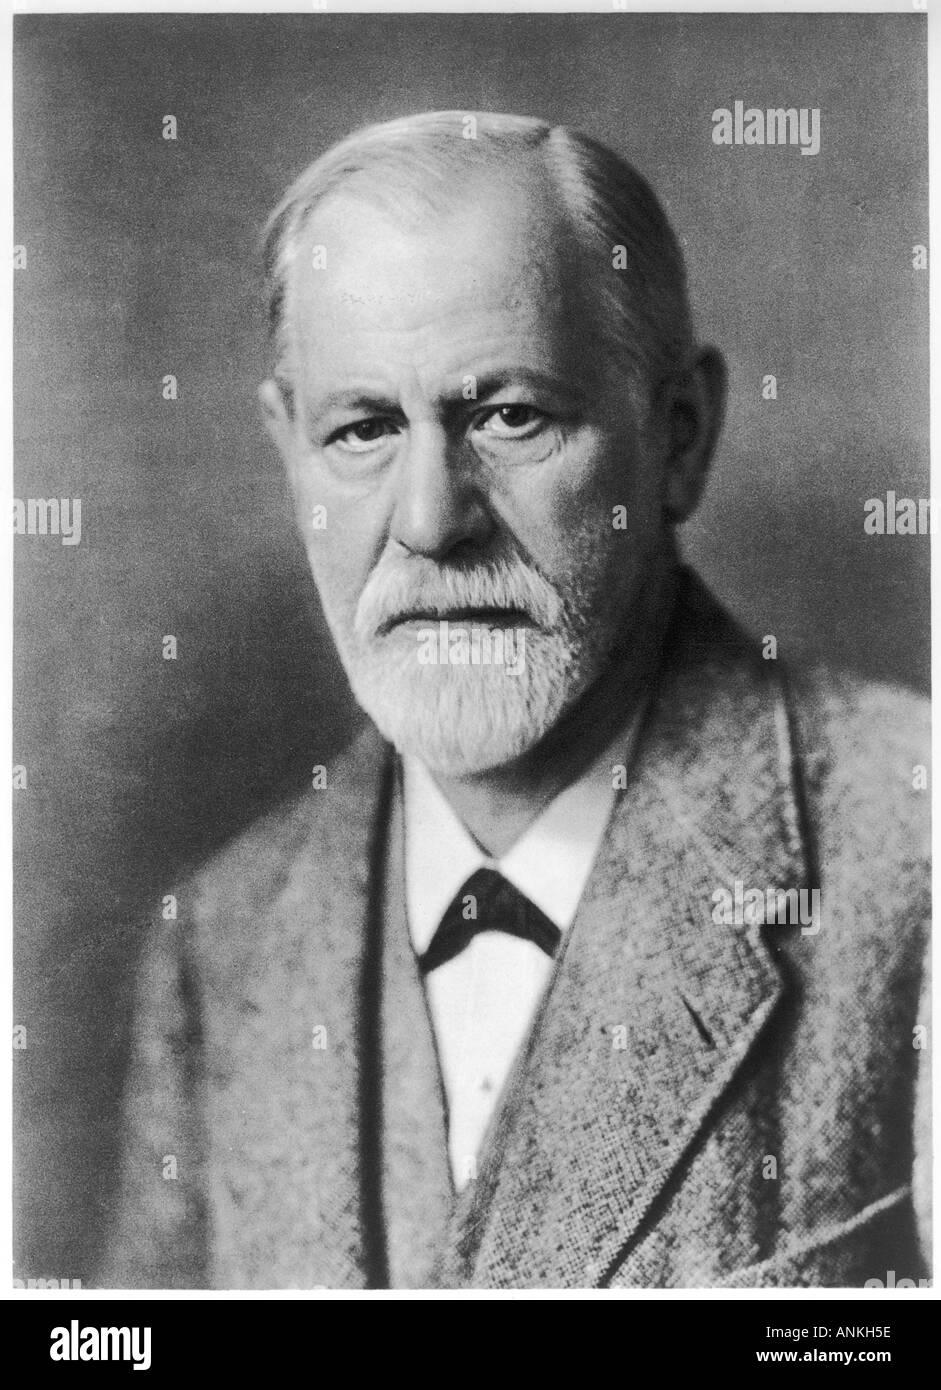 Sigmund Freud In 1922 14 - Stock Image